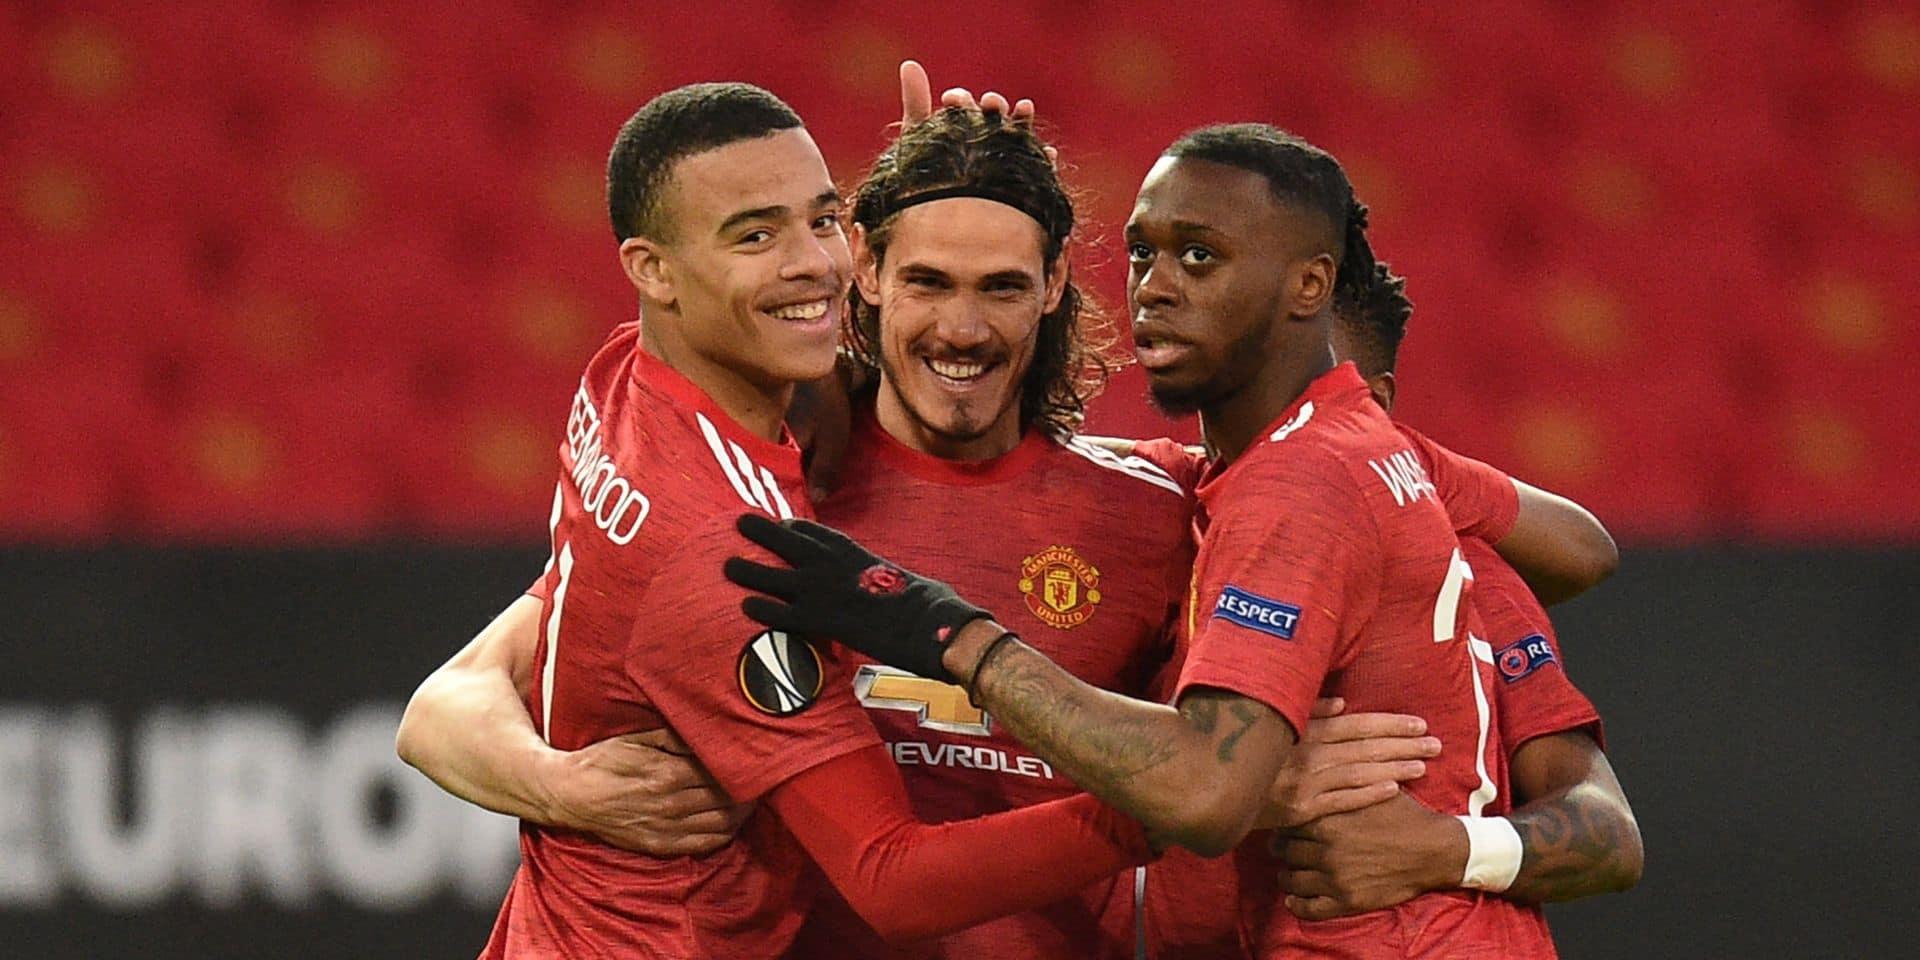 Pourquoi Manchester United doit convaincre Edinson Cavani de rester ?